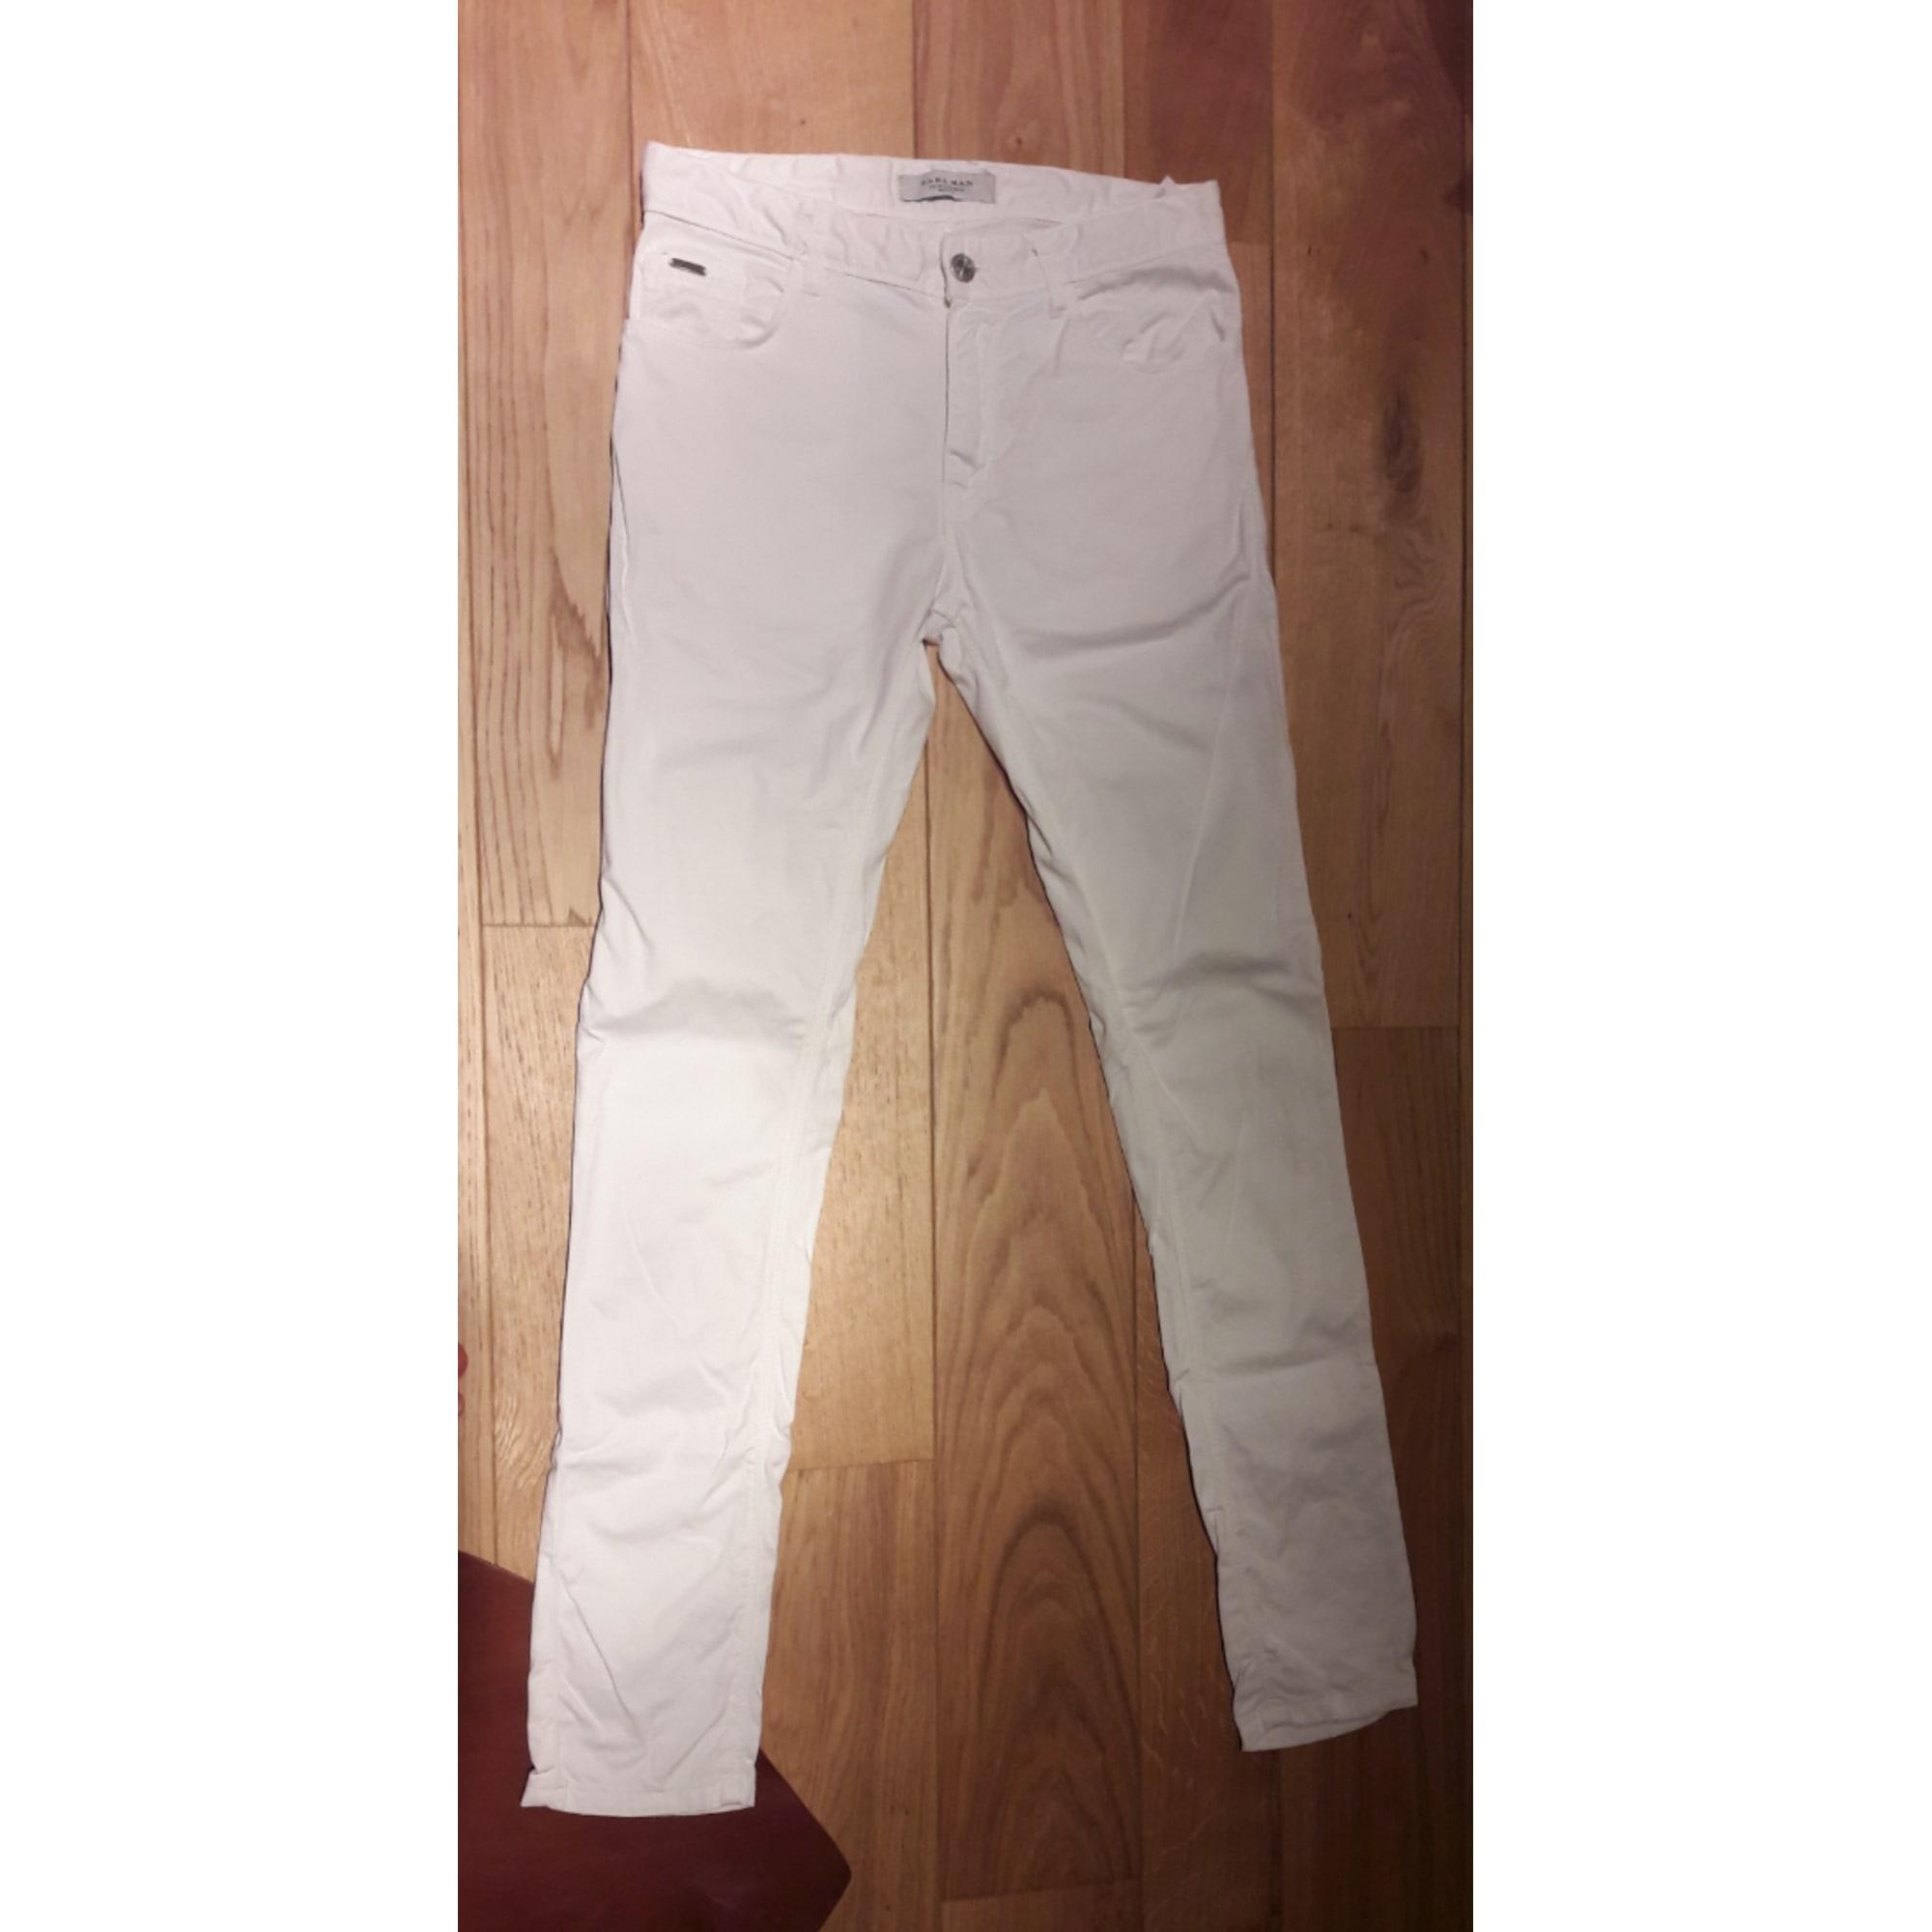 pantalon homme zara blanc